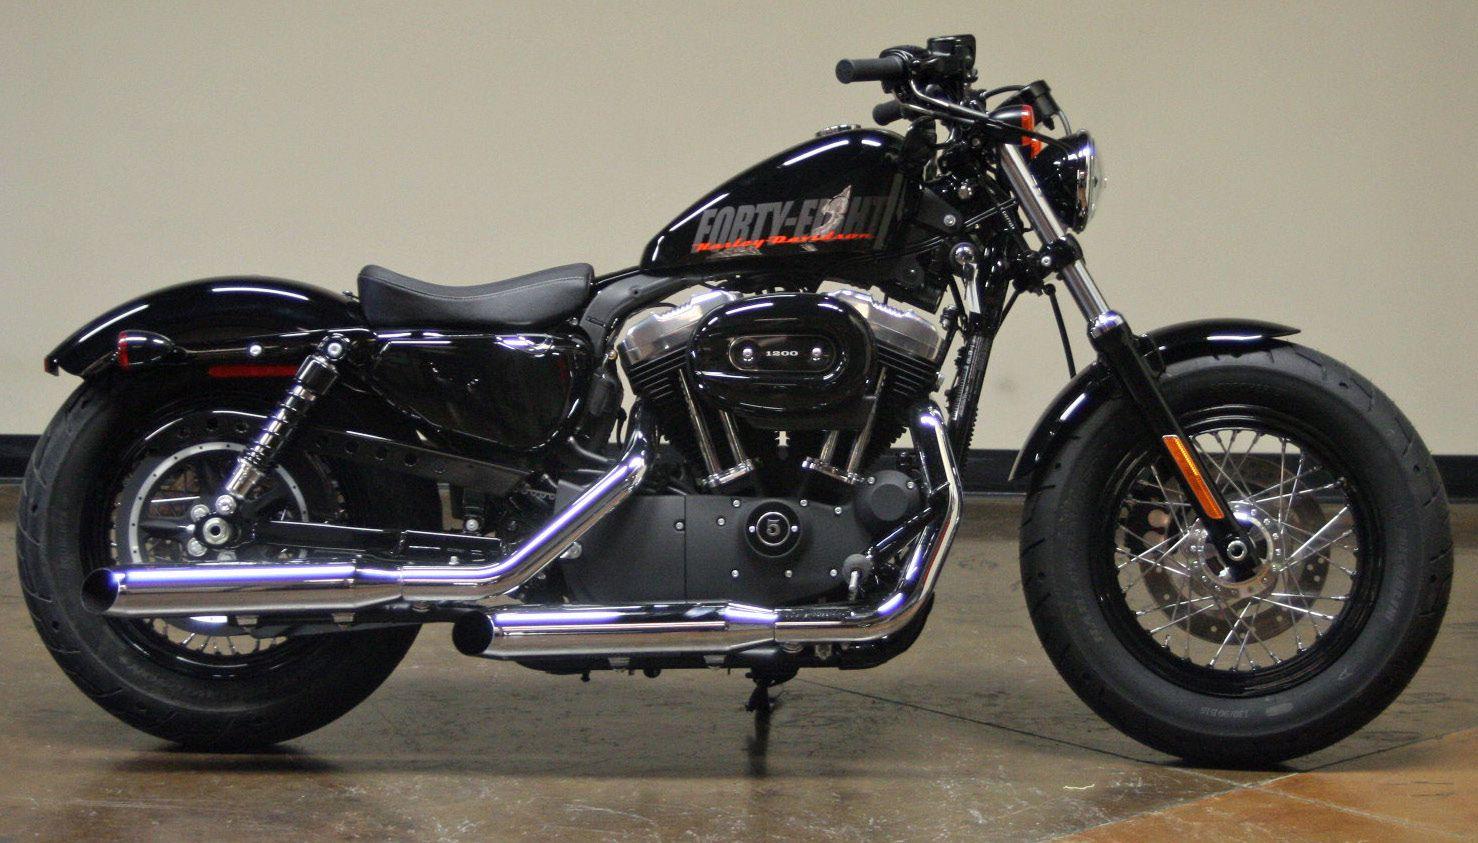 2013 Harley Davidson Sportster Service Repair Manual..☆.Instant Quality  Digital Download☆